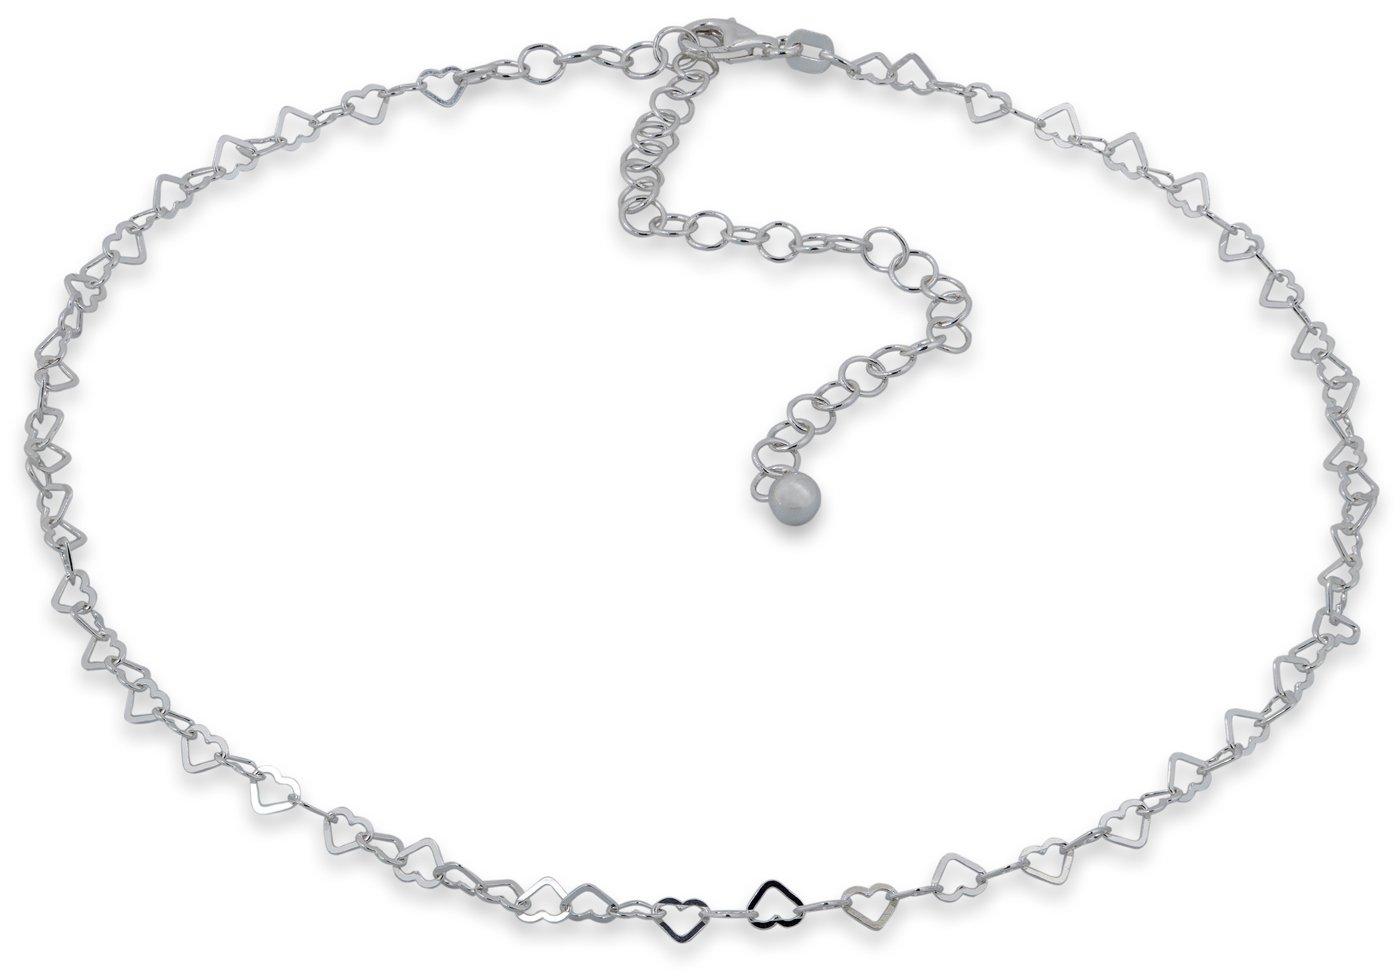 SilverLuxe Sterling Silver Heart Link Choker Necklace 12 + 4'' Size